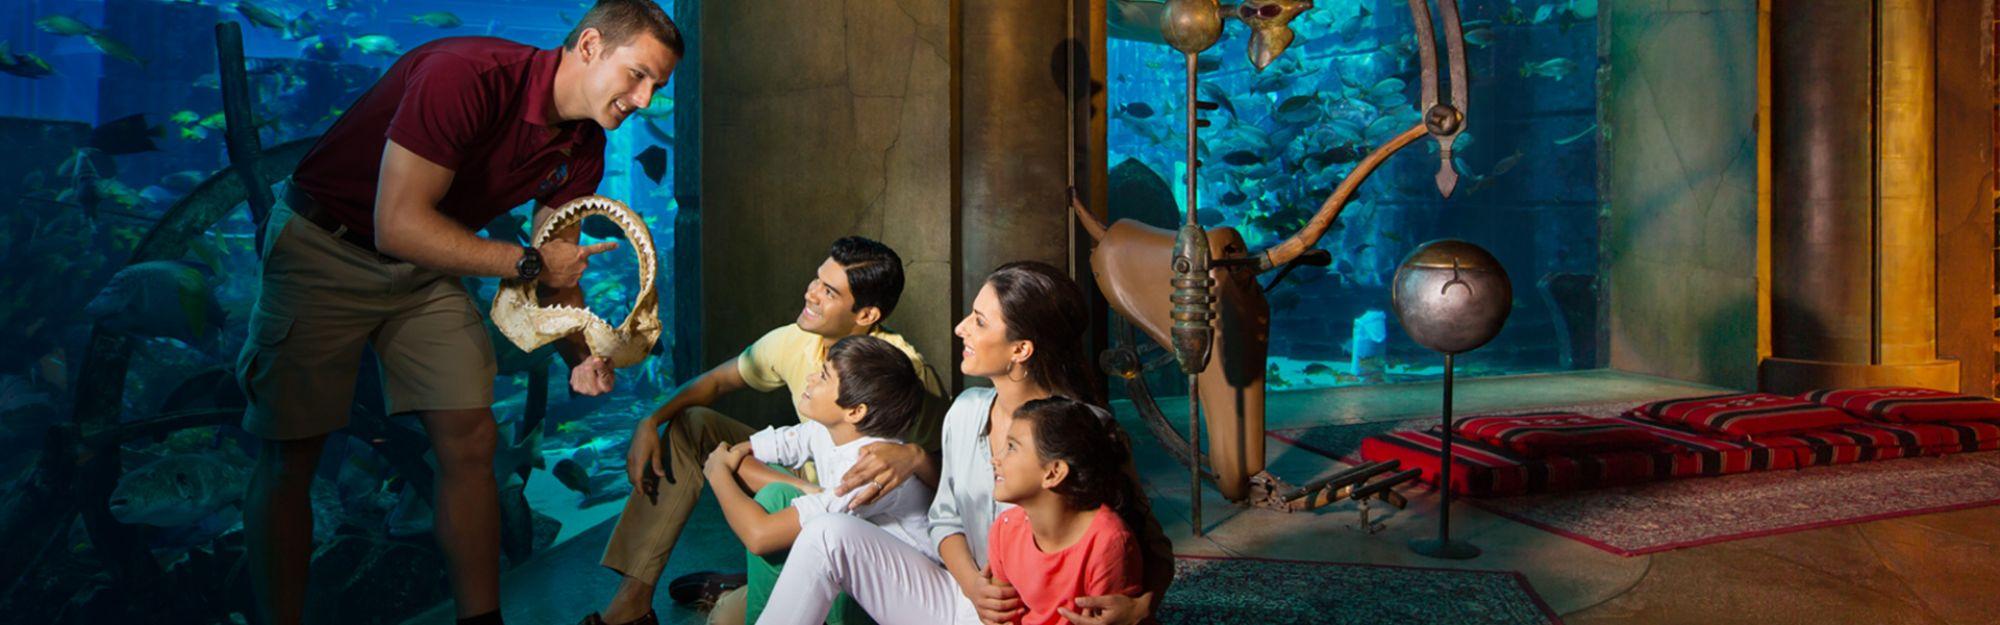 Dubai The Lost Chambers Aquarium